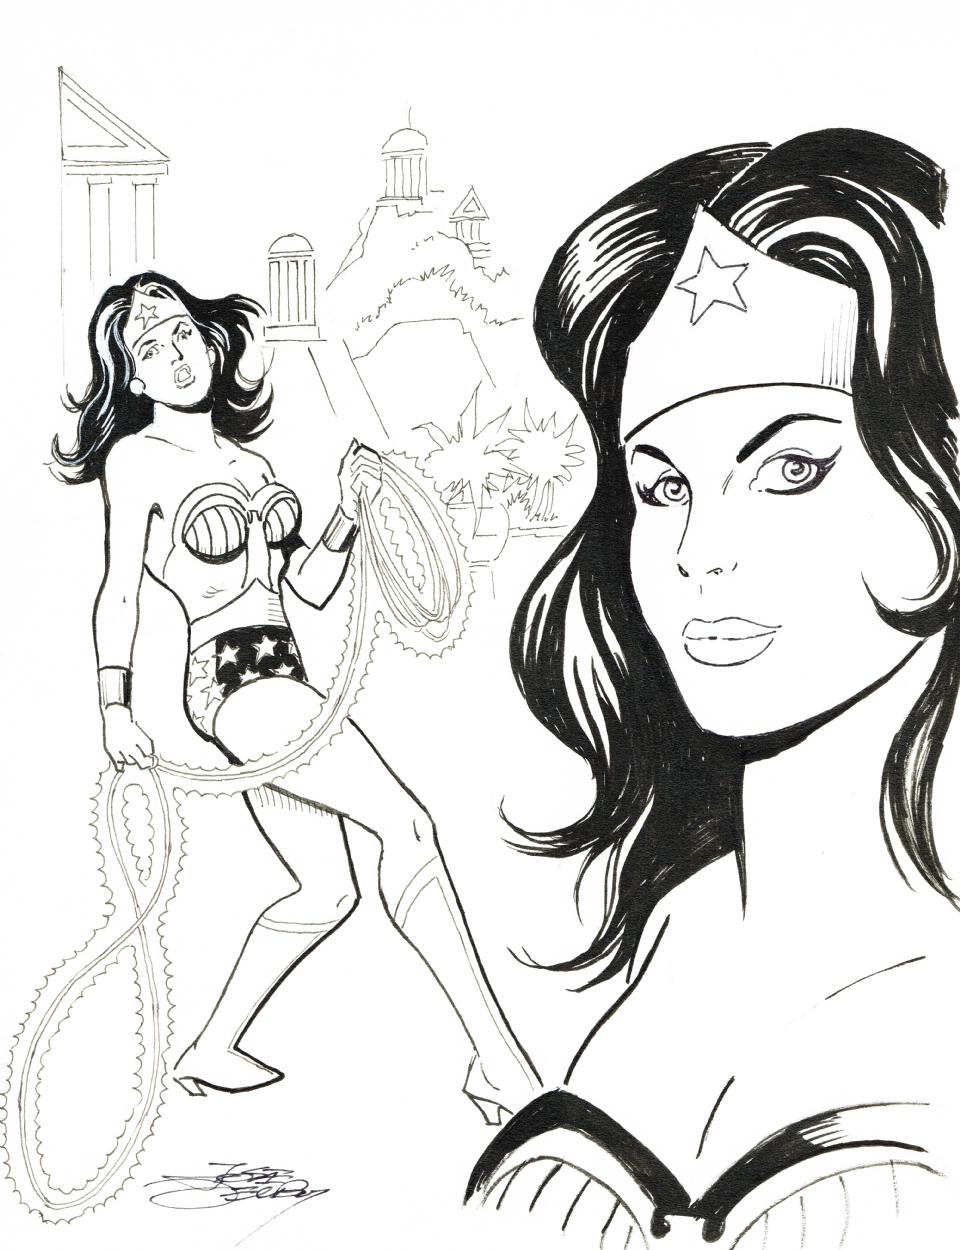 Wonder Woman commission by Jose Delbo.